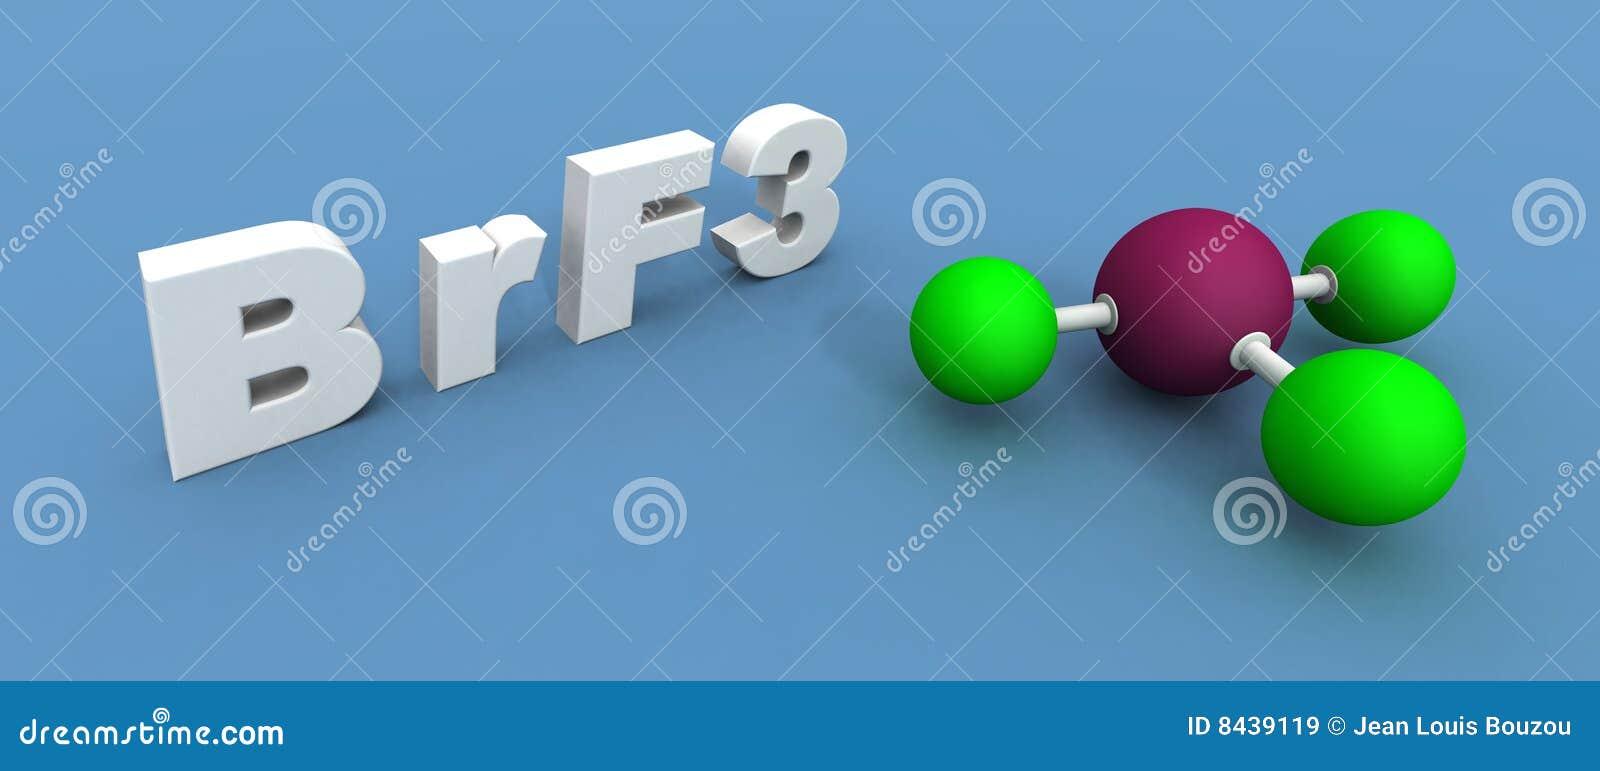 Bromine fluoride